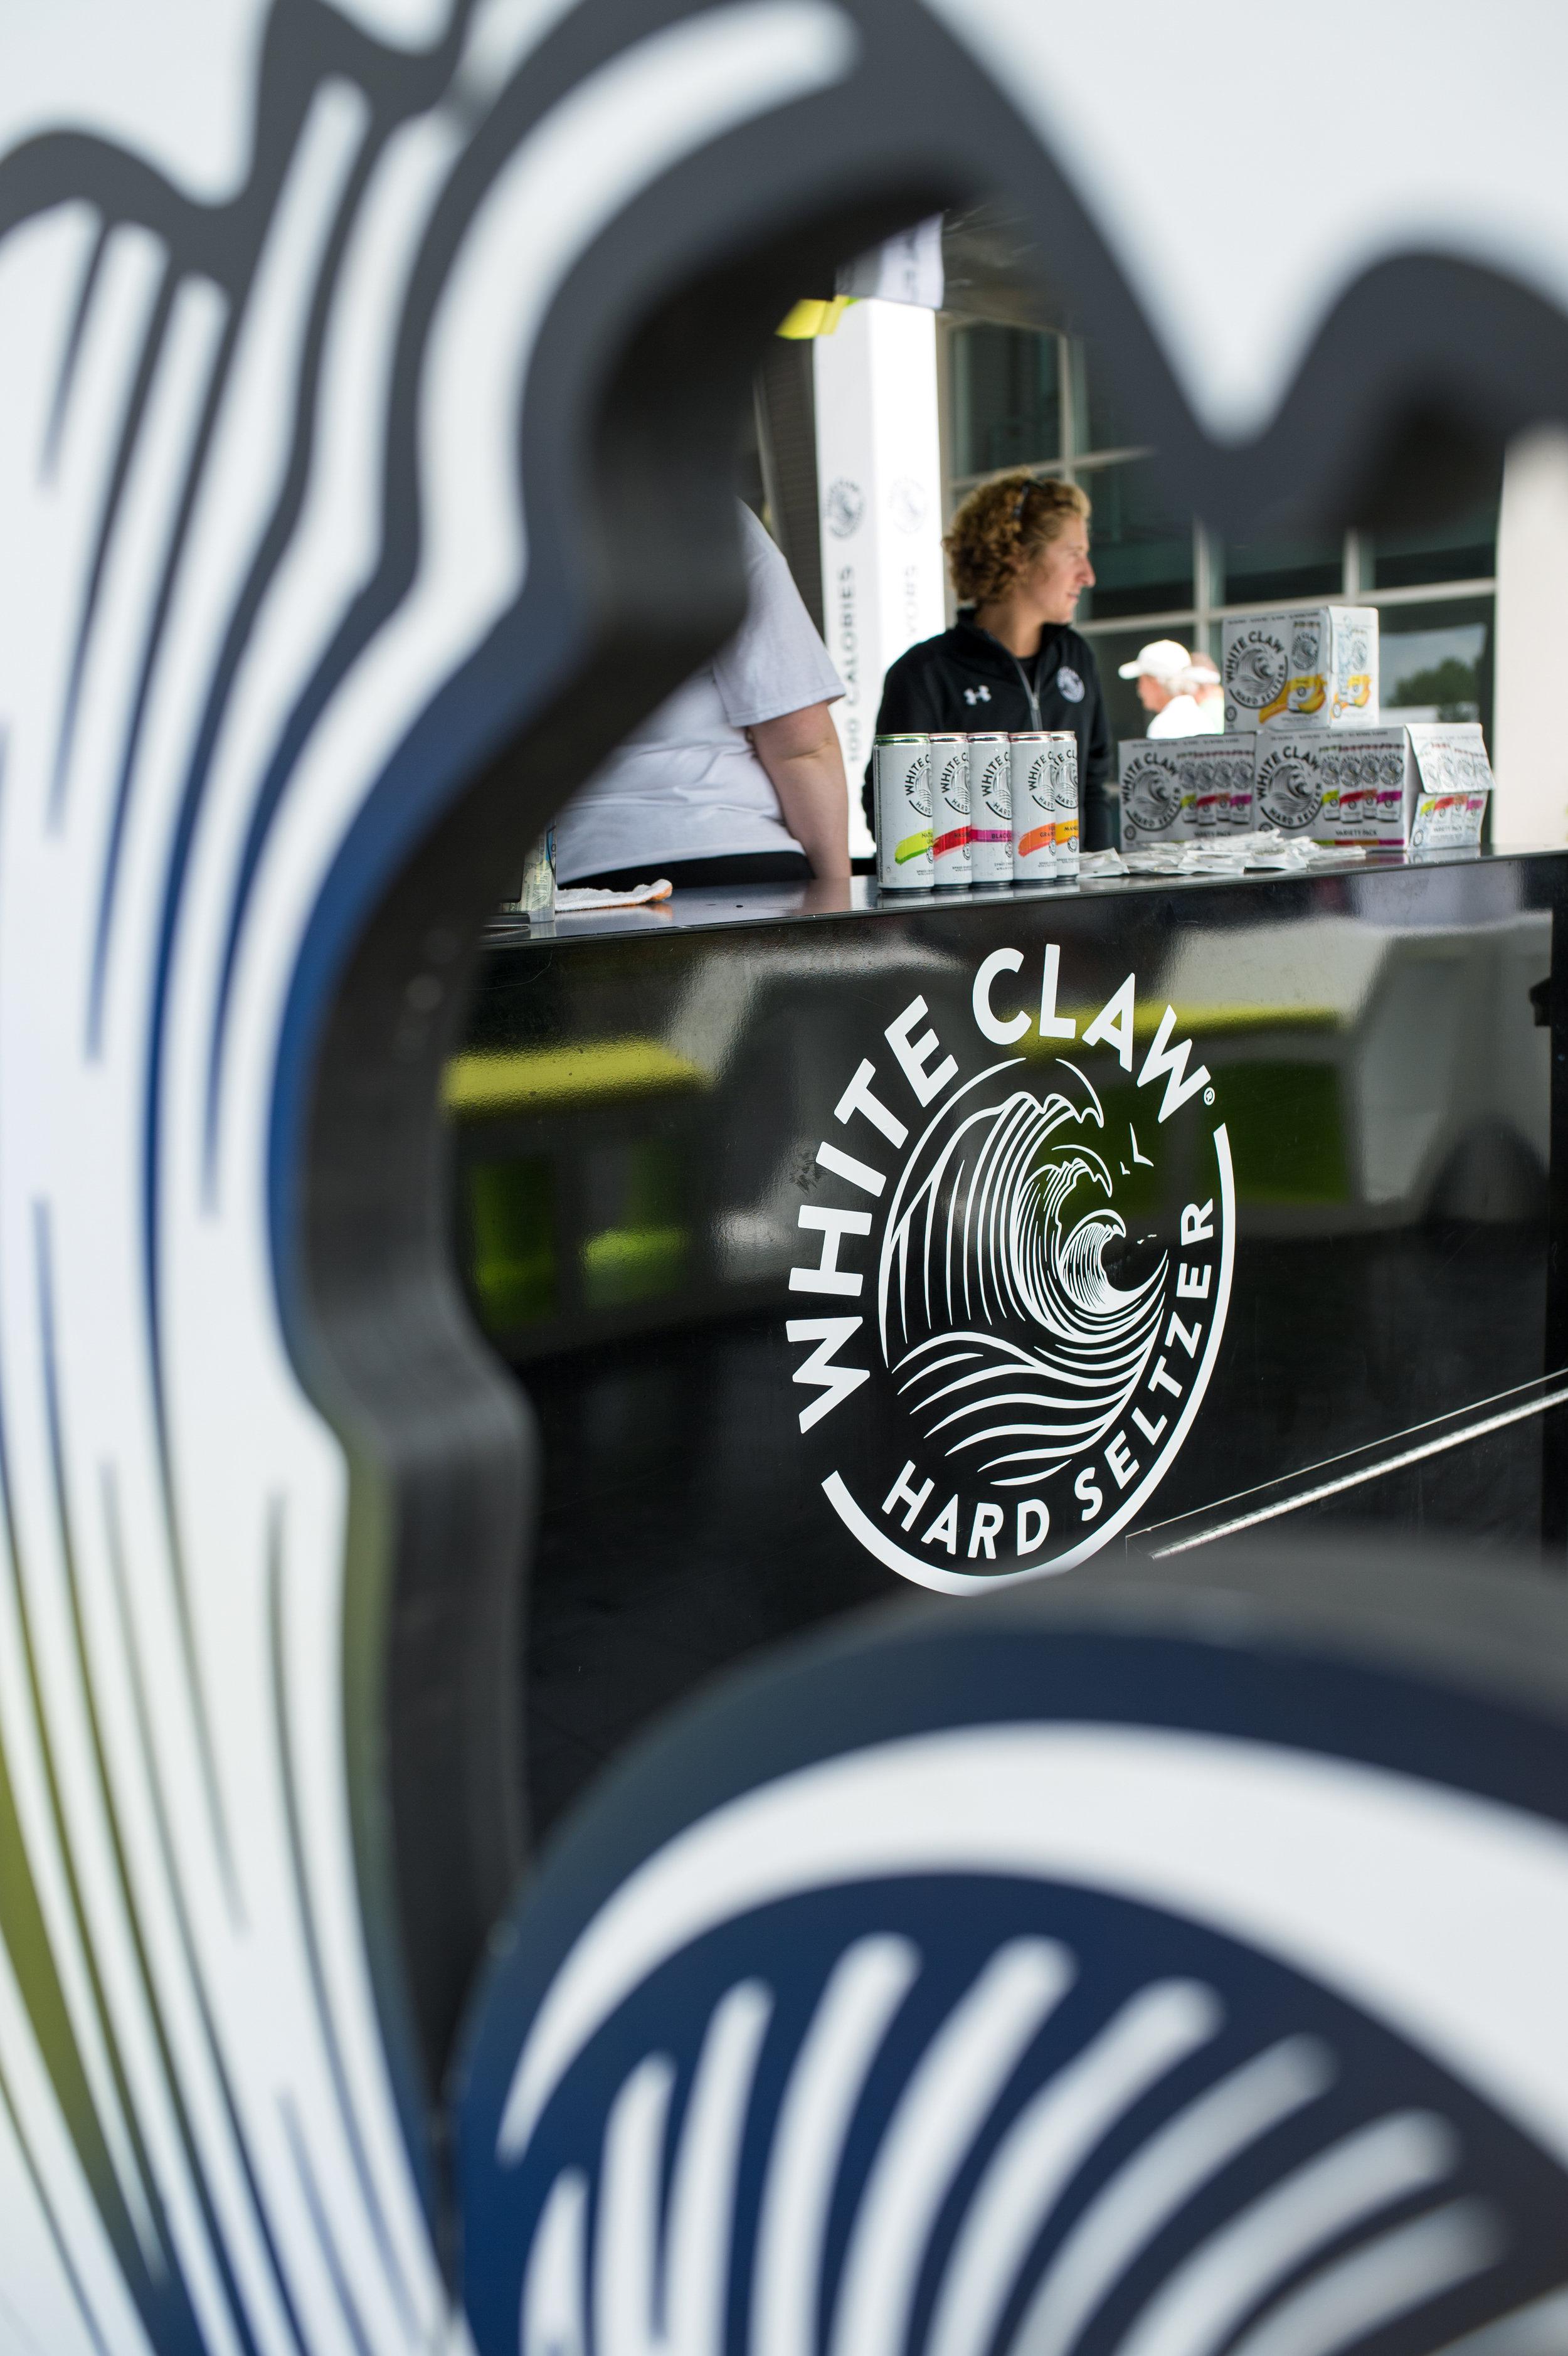 OHM-White Claw-Cincinnati Tennis Open-Top Selects-3515.jpg